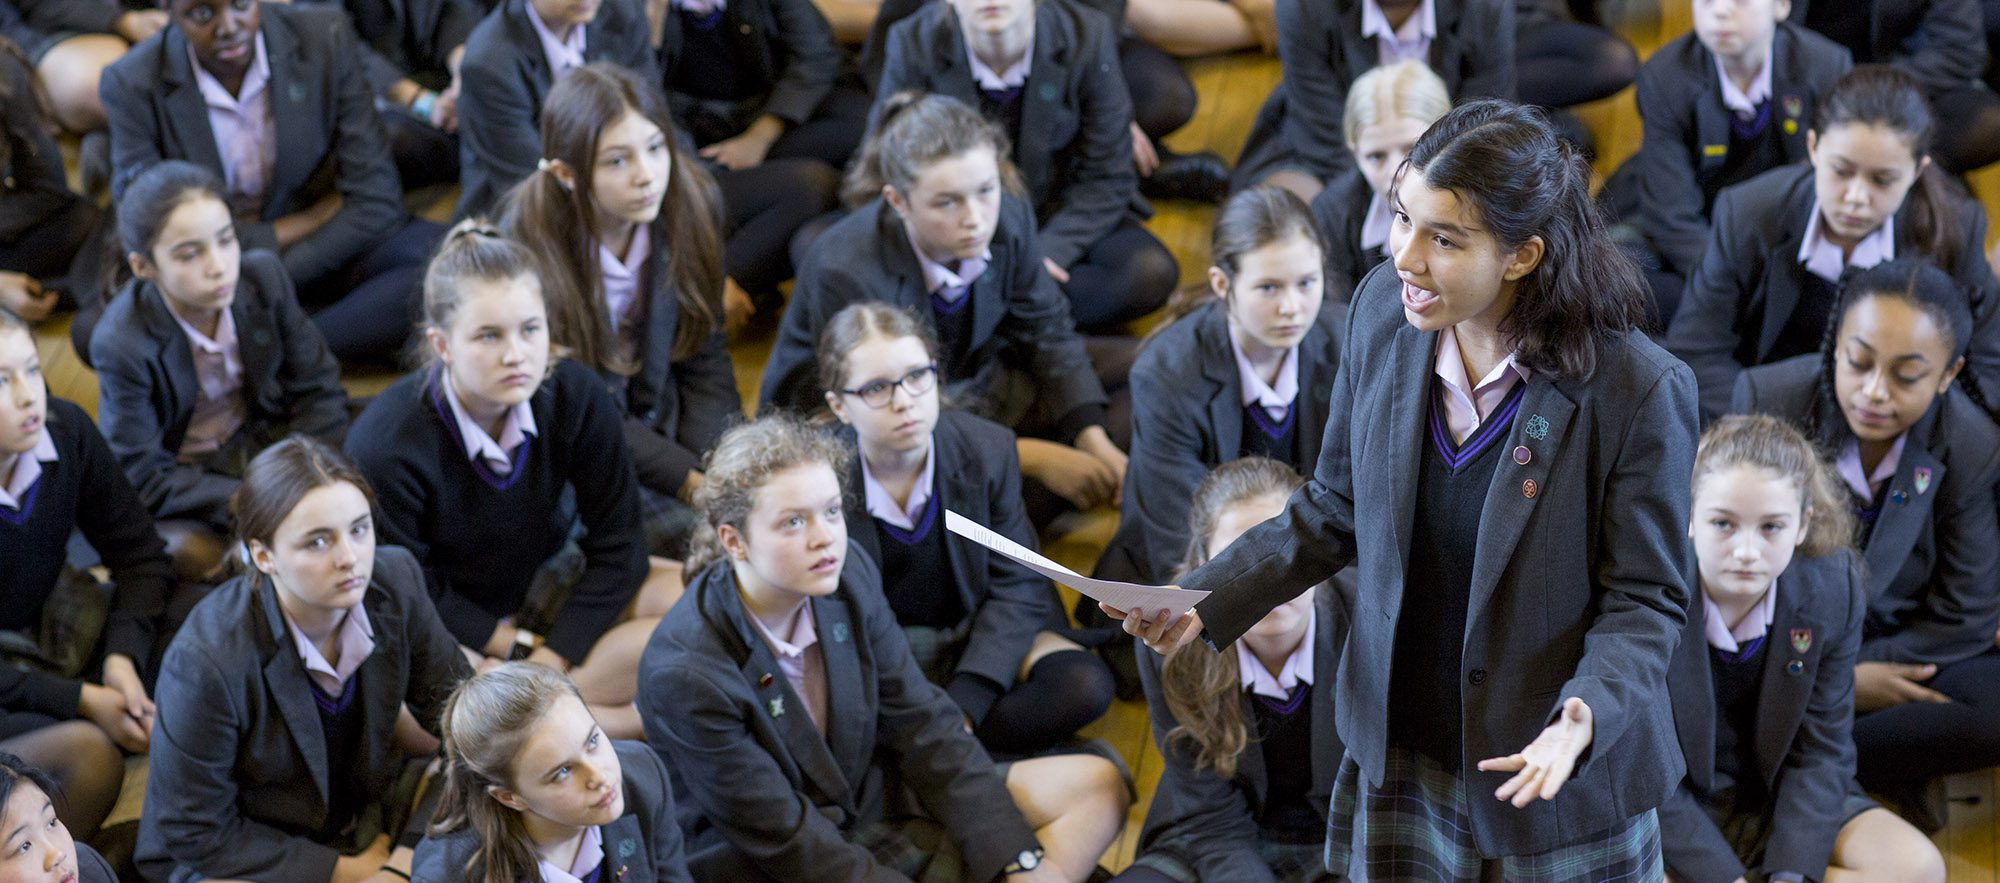 Secondary Education & Senior School | Streatham & Clapham High School